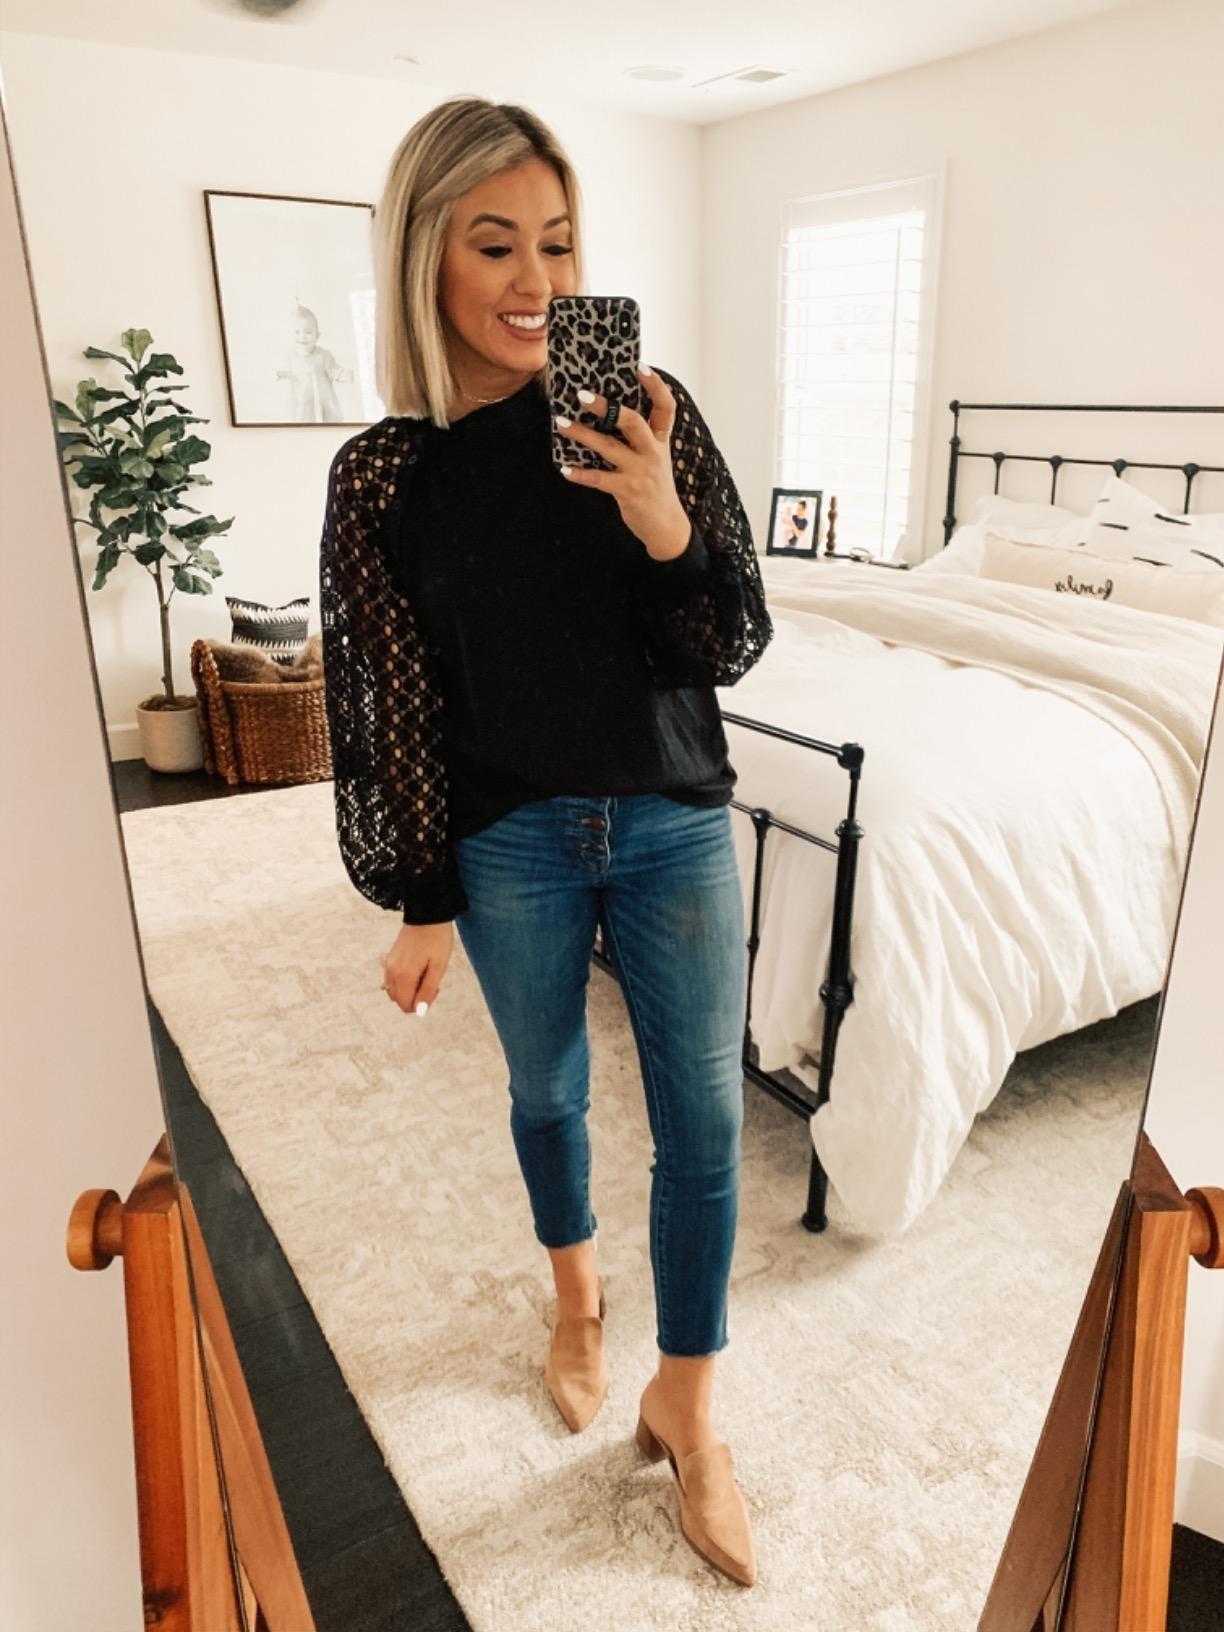 Reviewer wearing black blouse